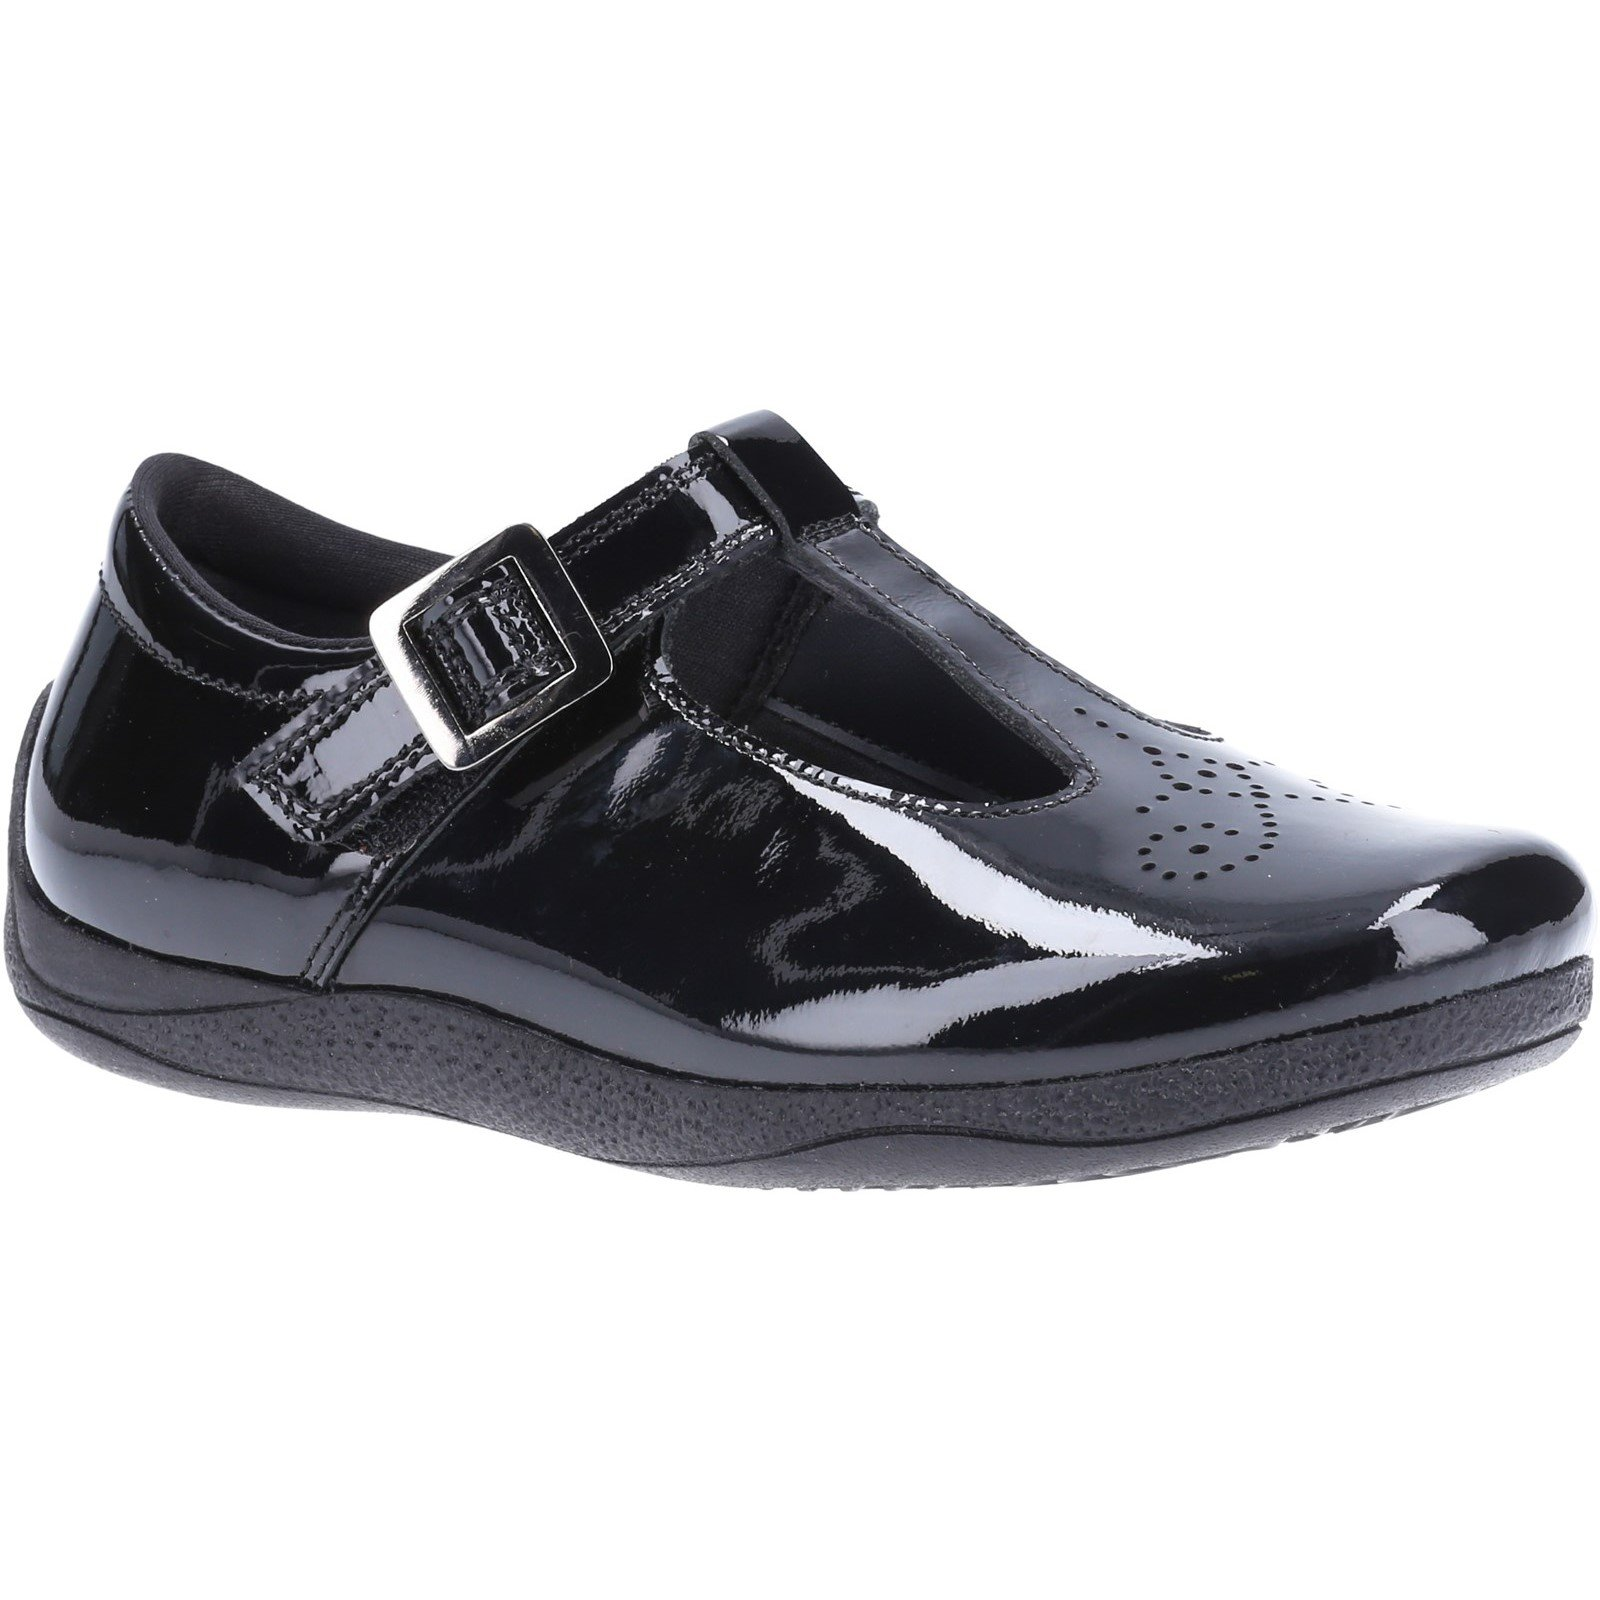 Hush Puppies Kid's Eliza Senior School Shoe Patent Black 32592 - Patent Black 6